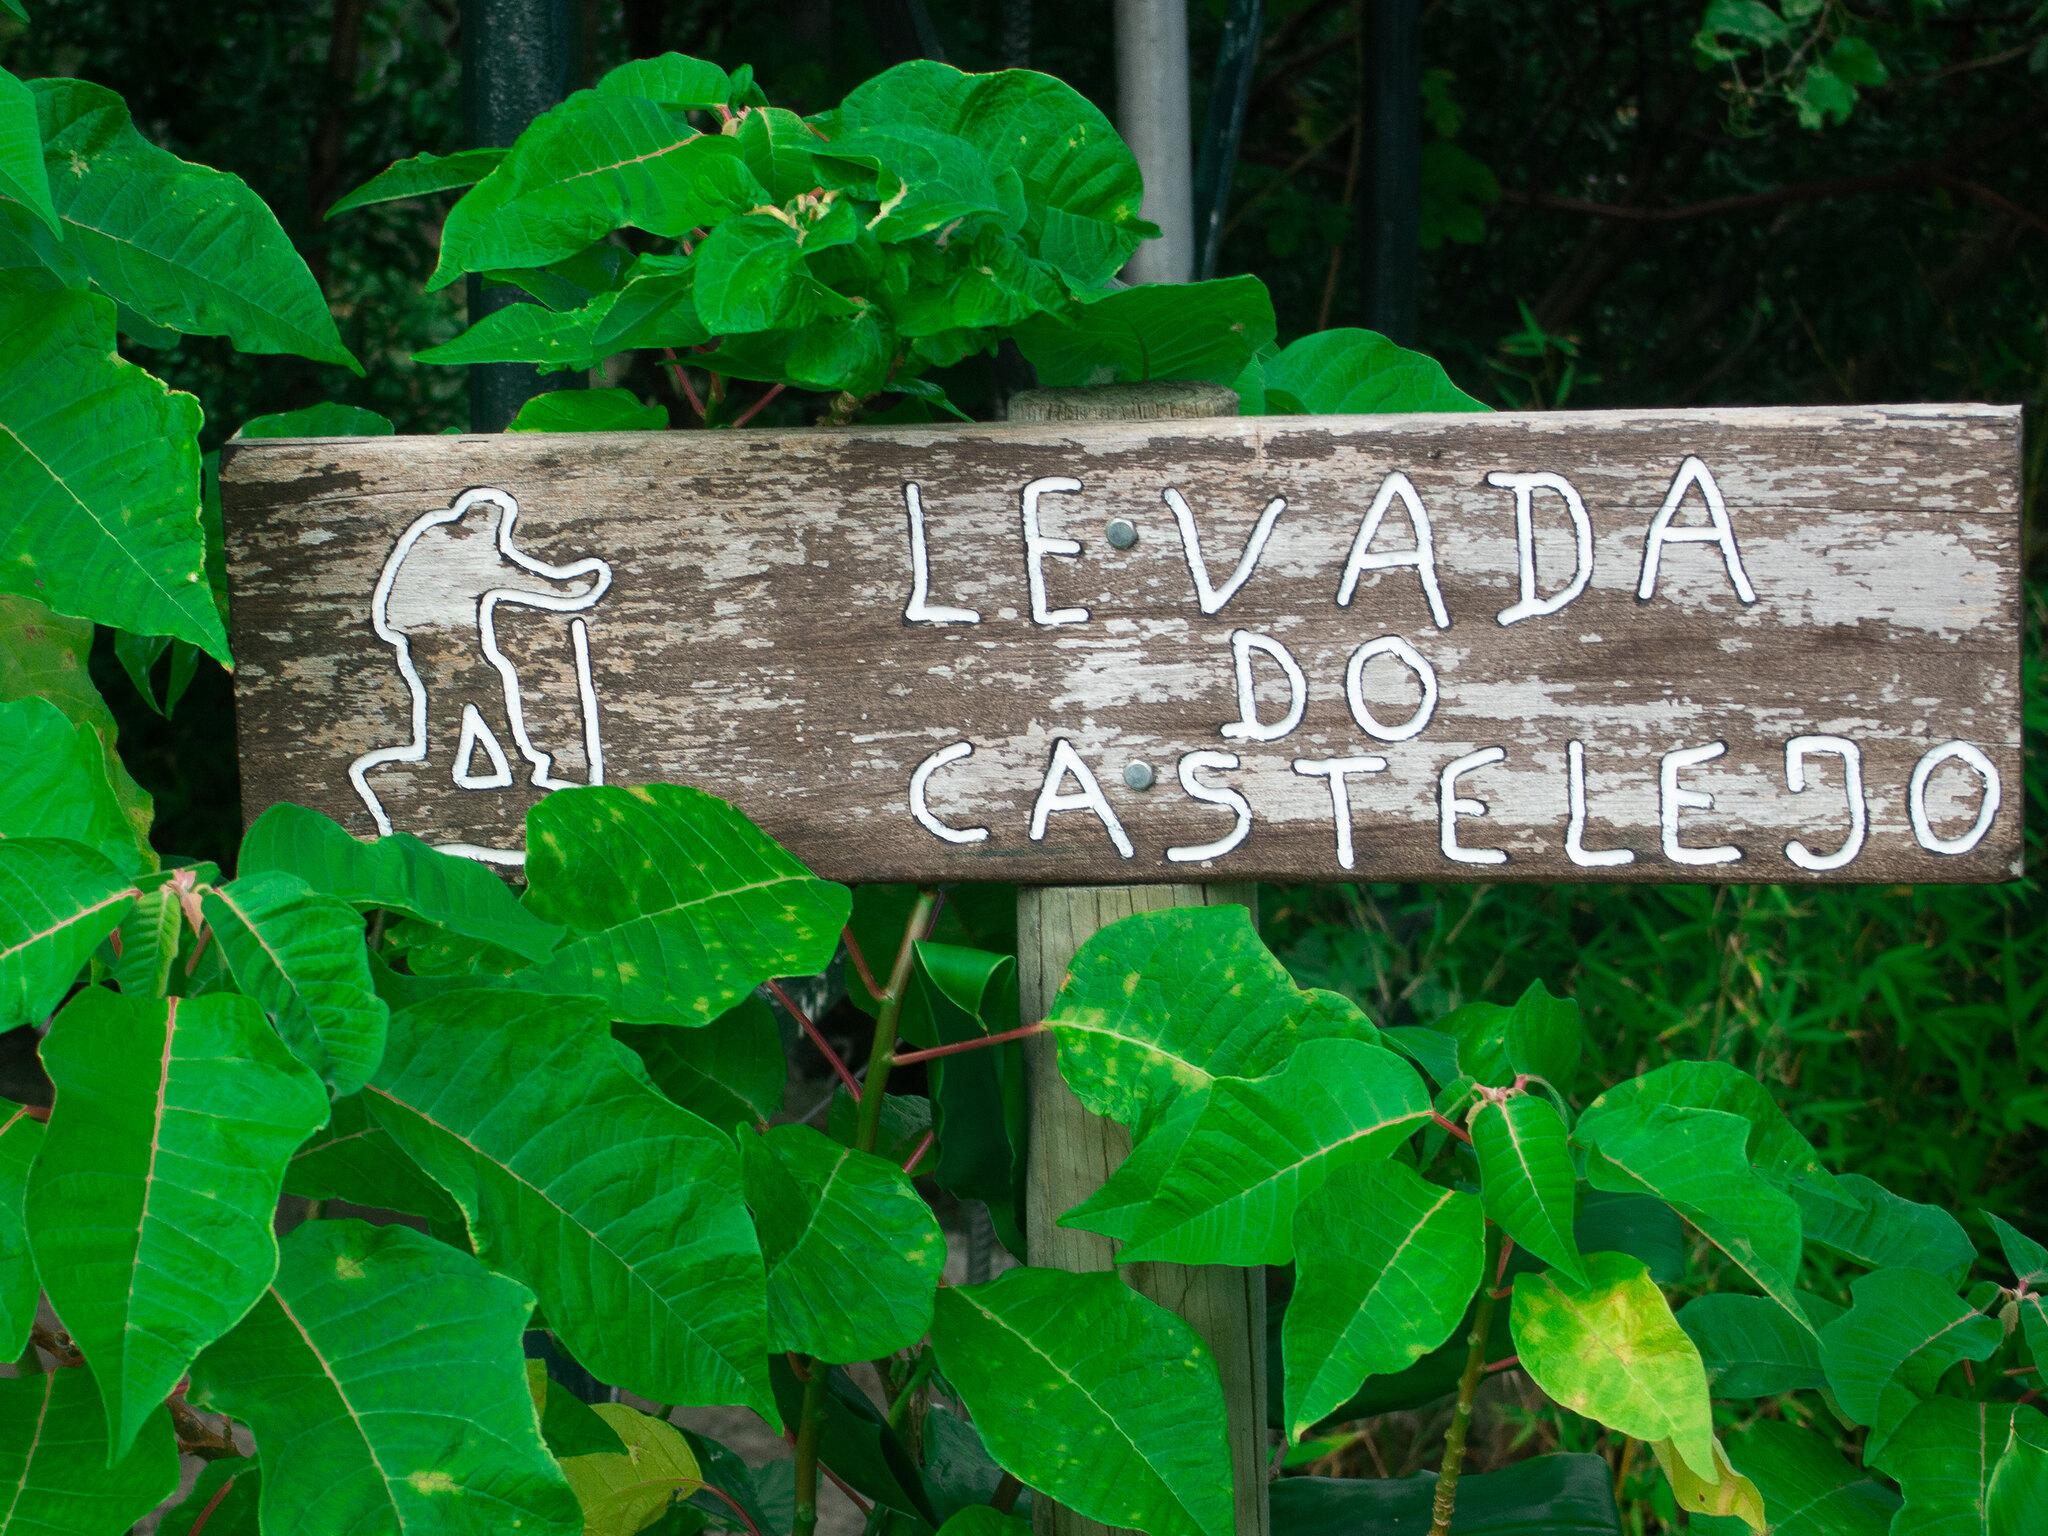 Castelejo Levada Annukka Vuorela14